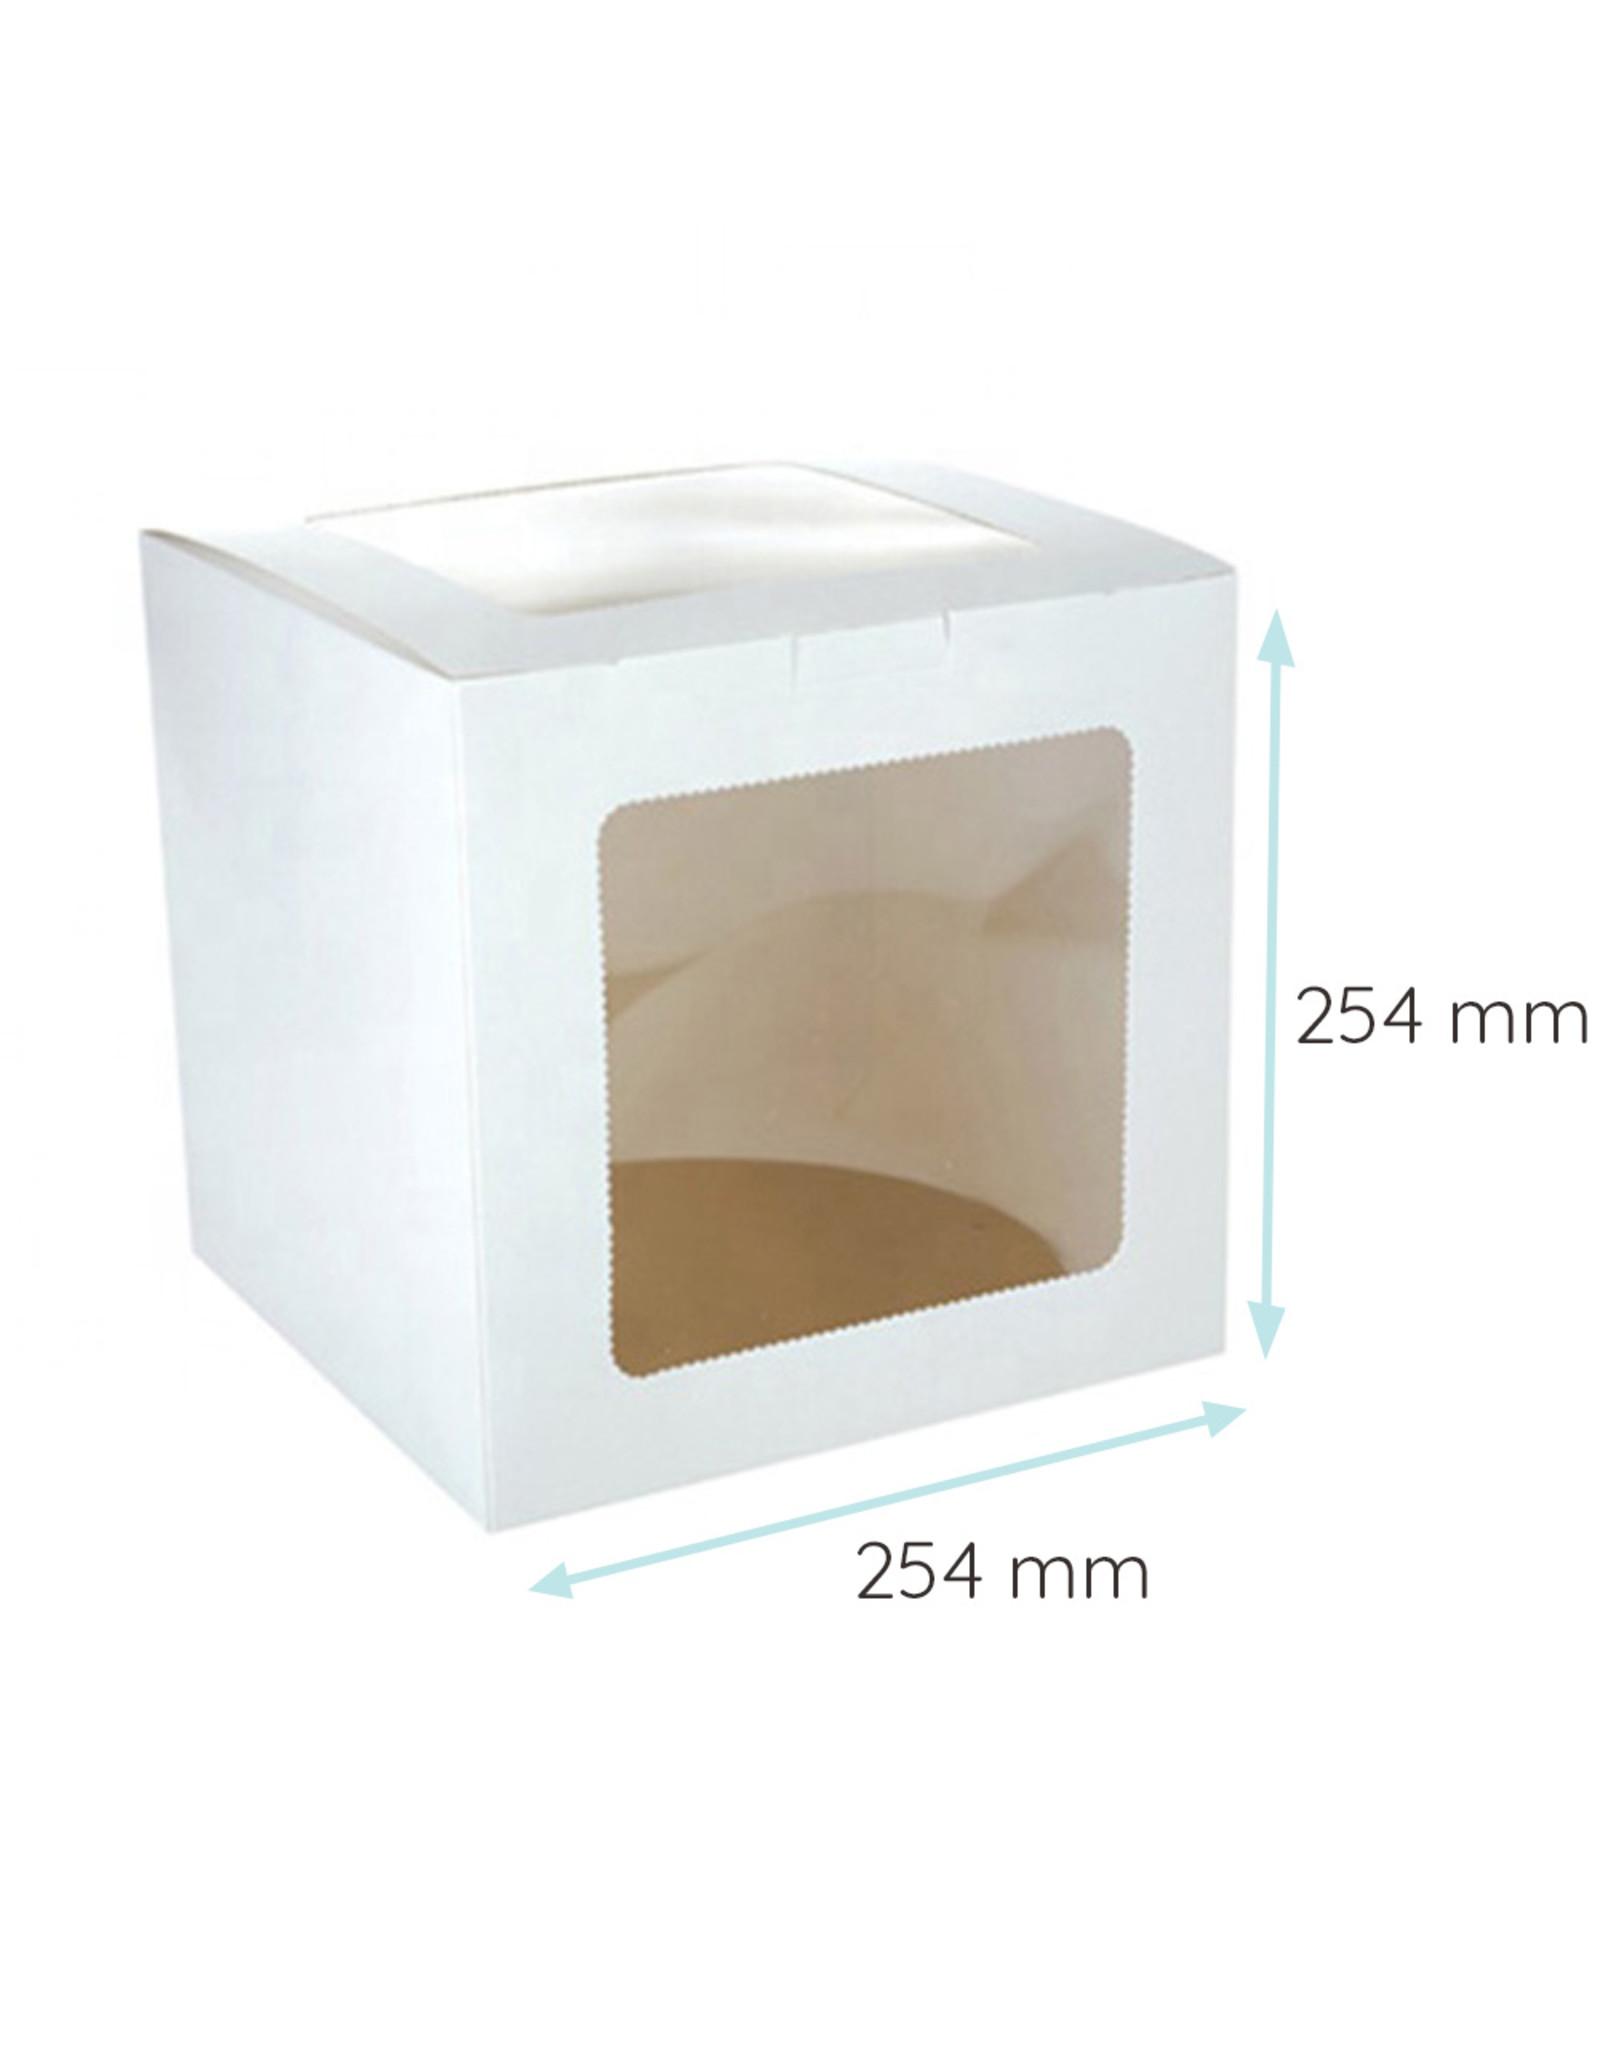 Economy tall cake box - 254 x 254 x 254 cm (10 pcs.)